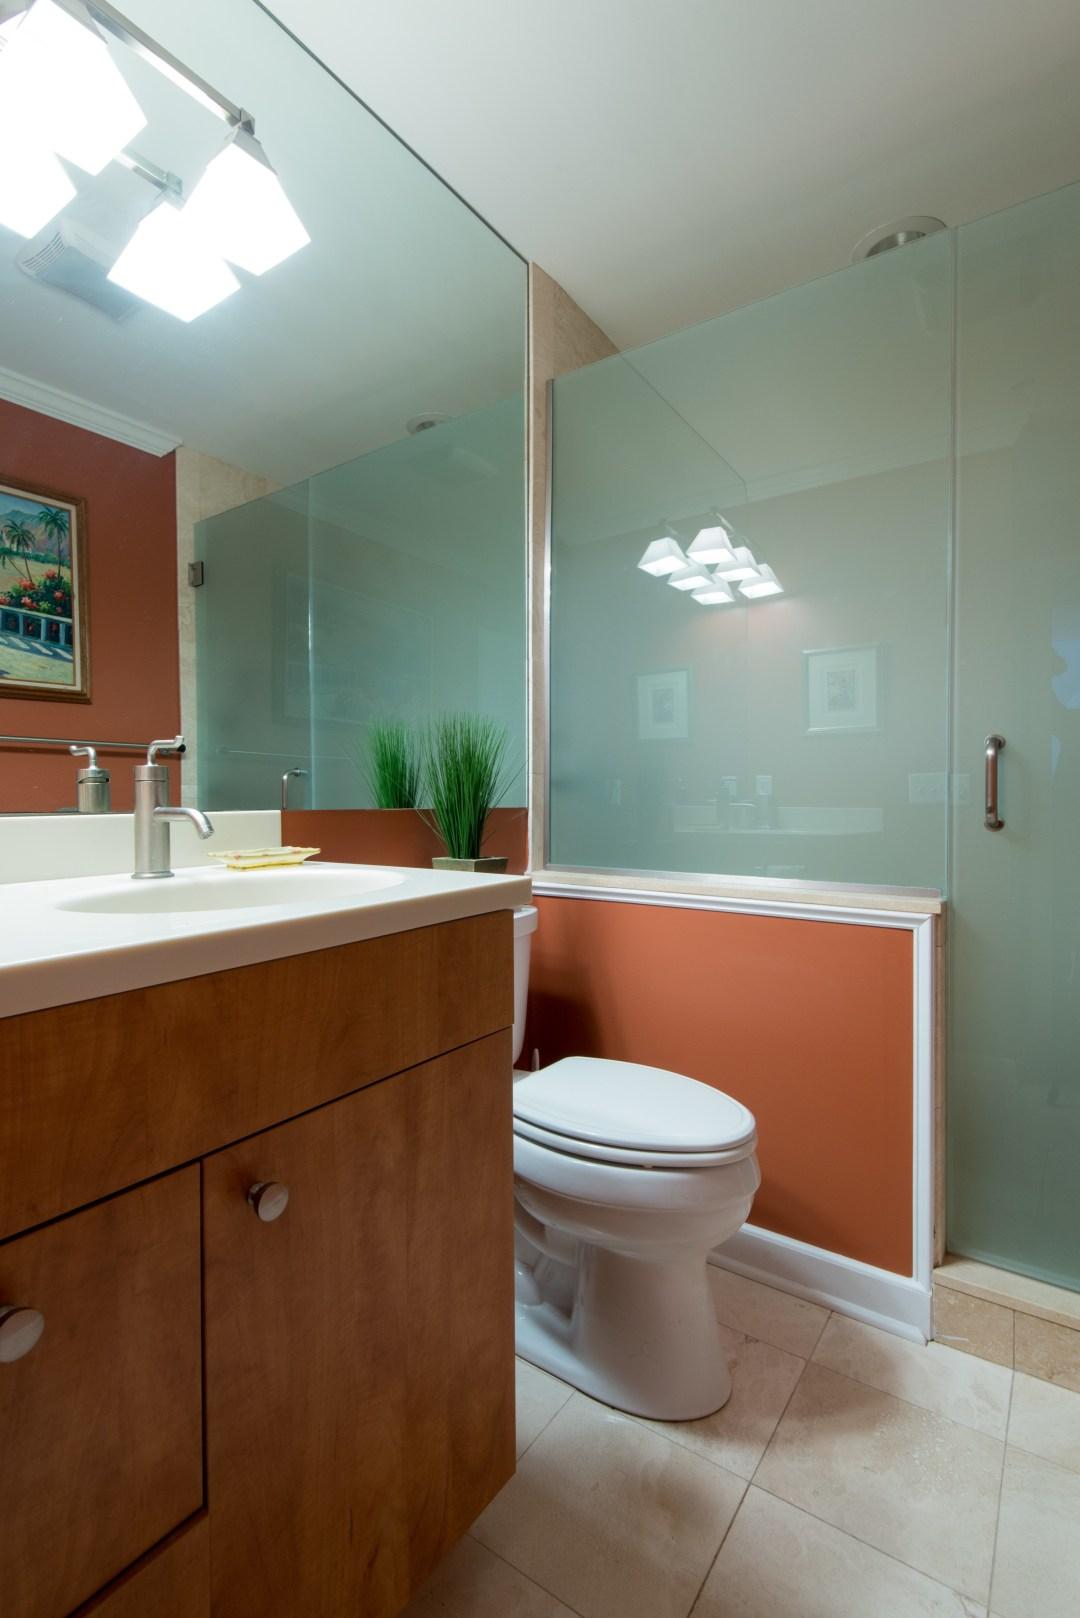 Bathroom Remodel in Kings Grant, Fenwick Island DE with Wood Vanity, White Top, Matte Glass Shower Door and Full Length Mirror